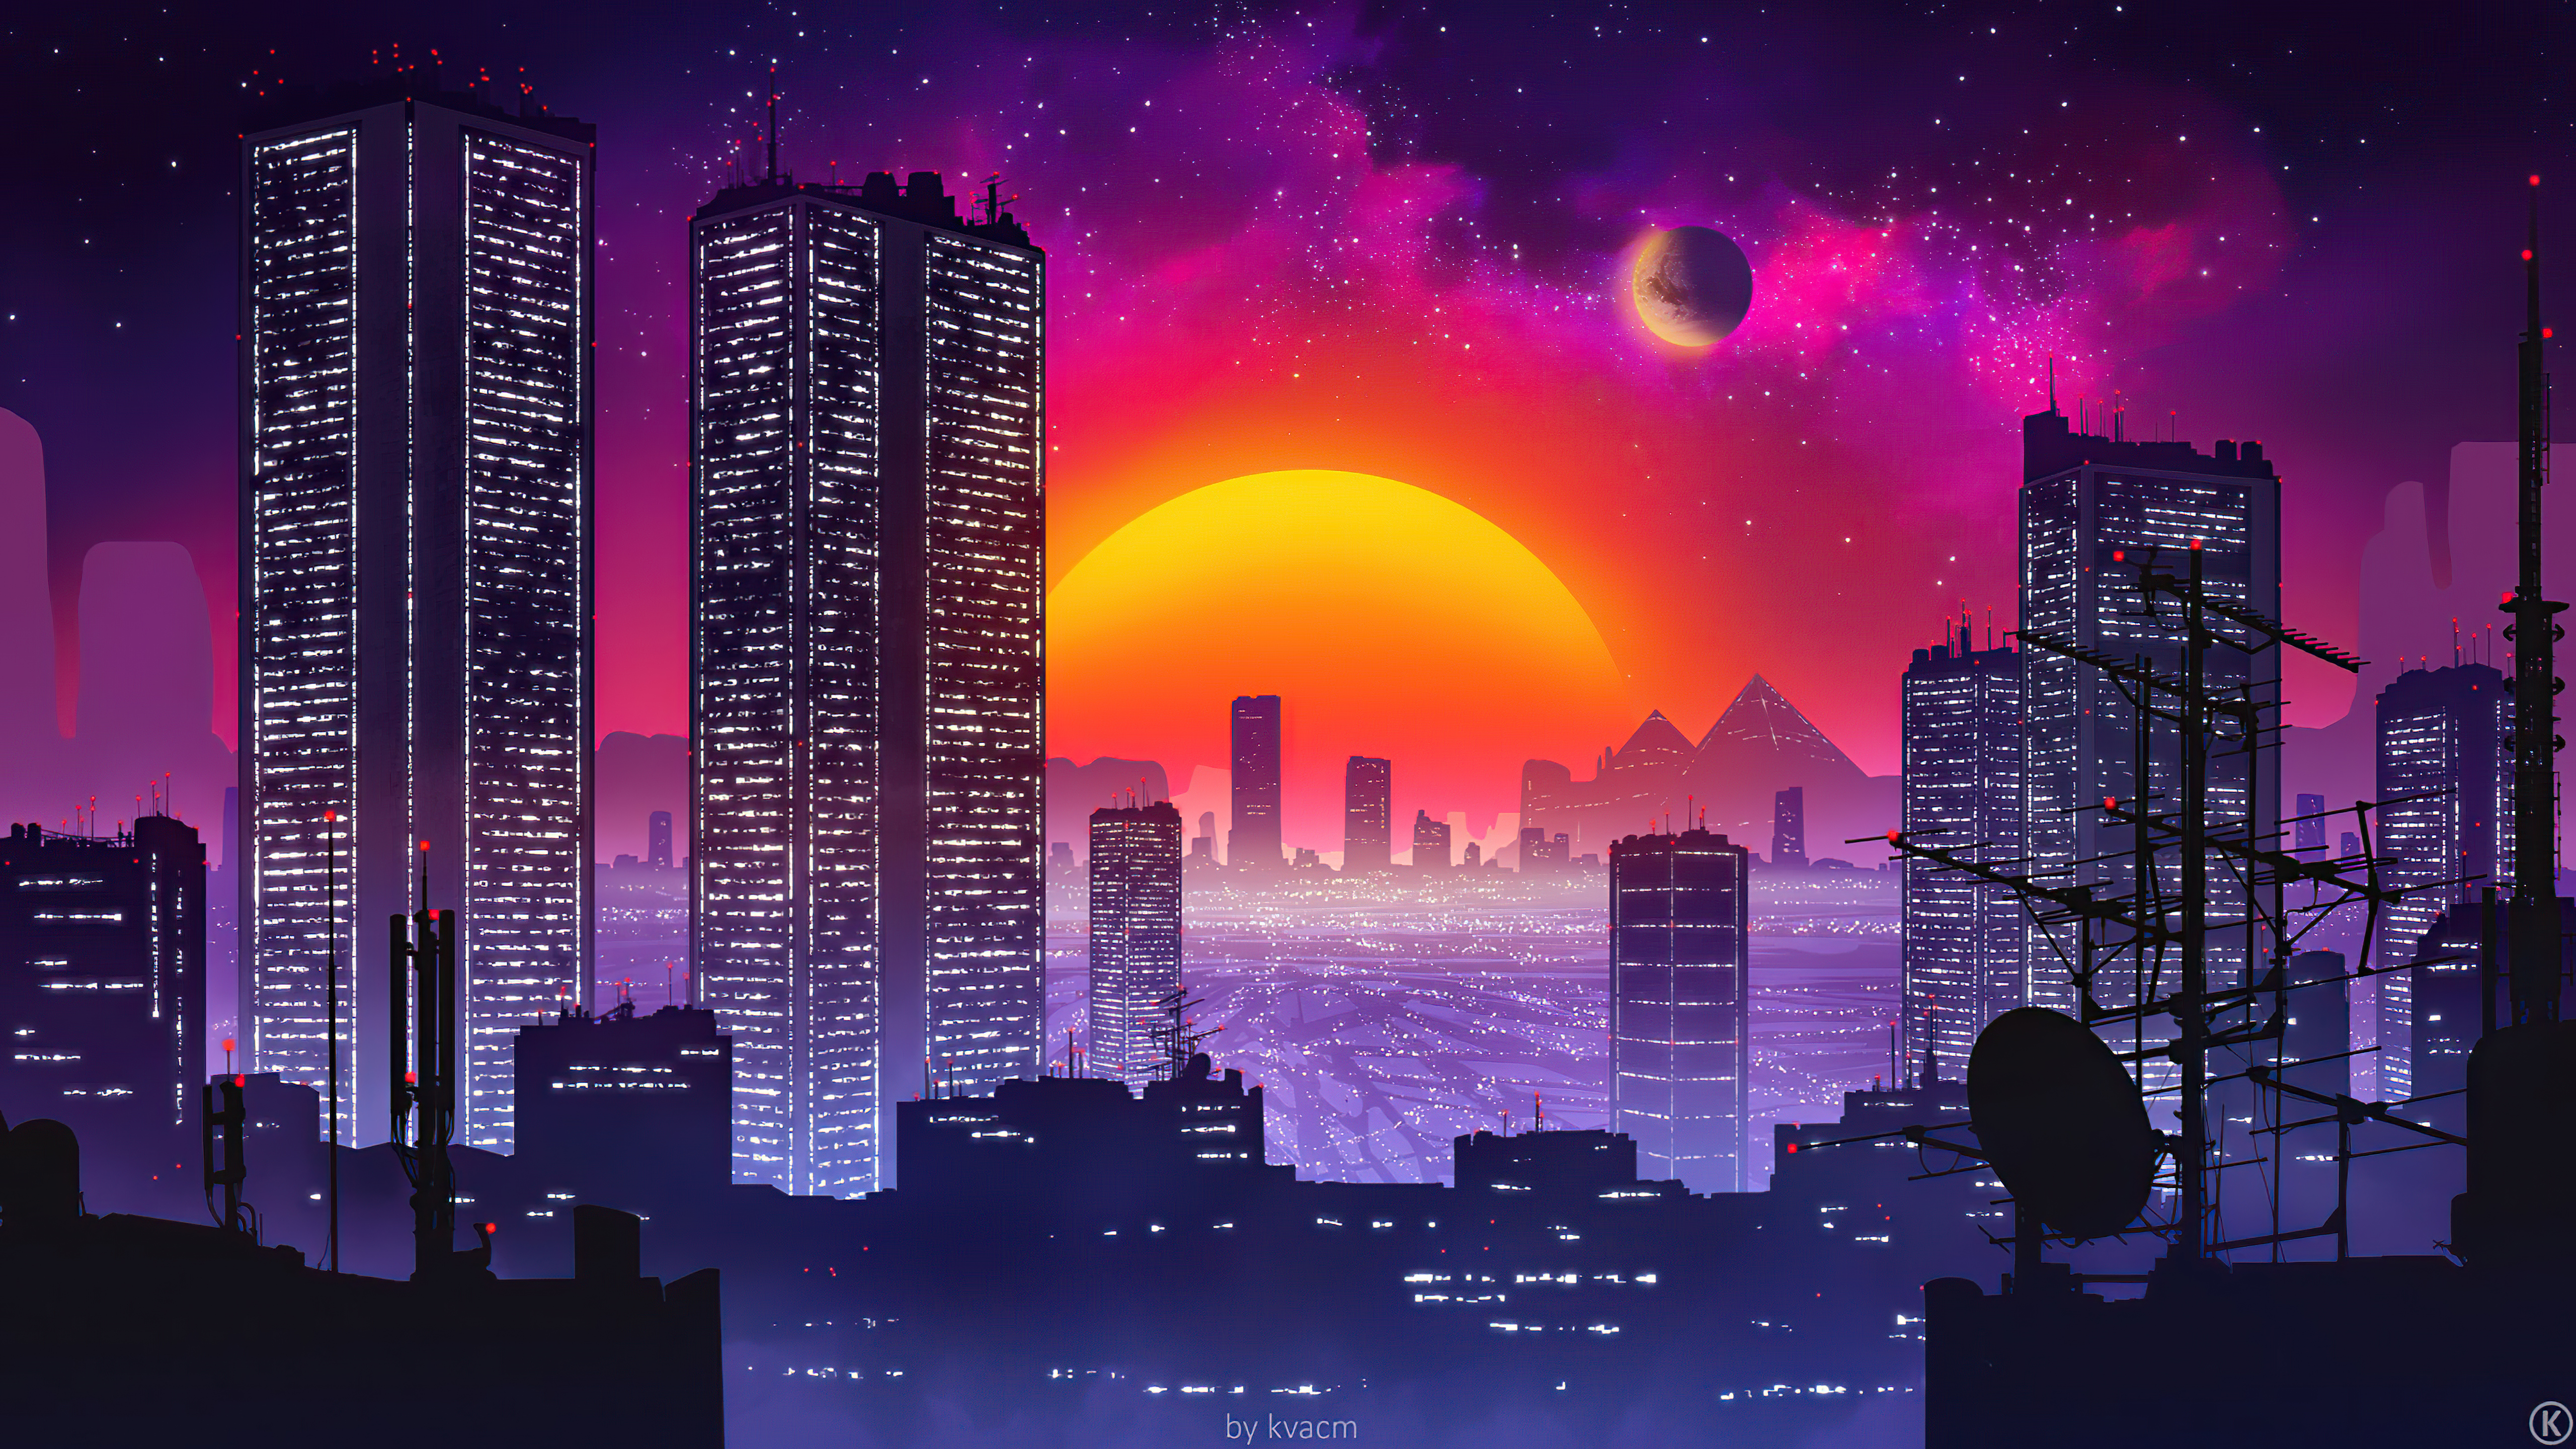 city retrowave sunset 4k 1618133345 - City Retrowave Sunset 4k - City Retrowave Sunset 4k wallpapers